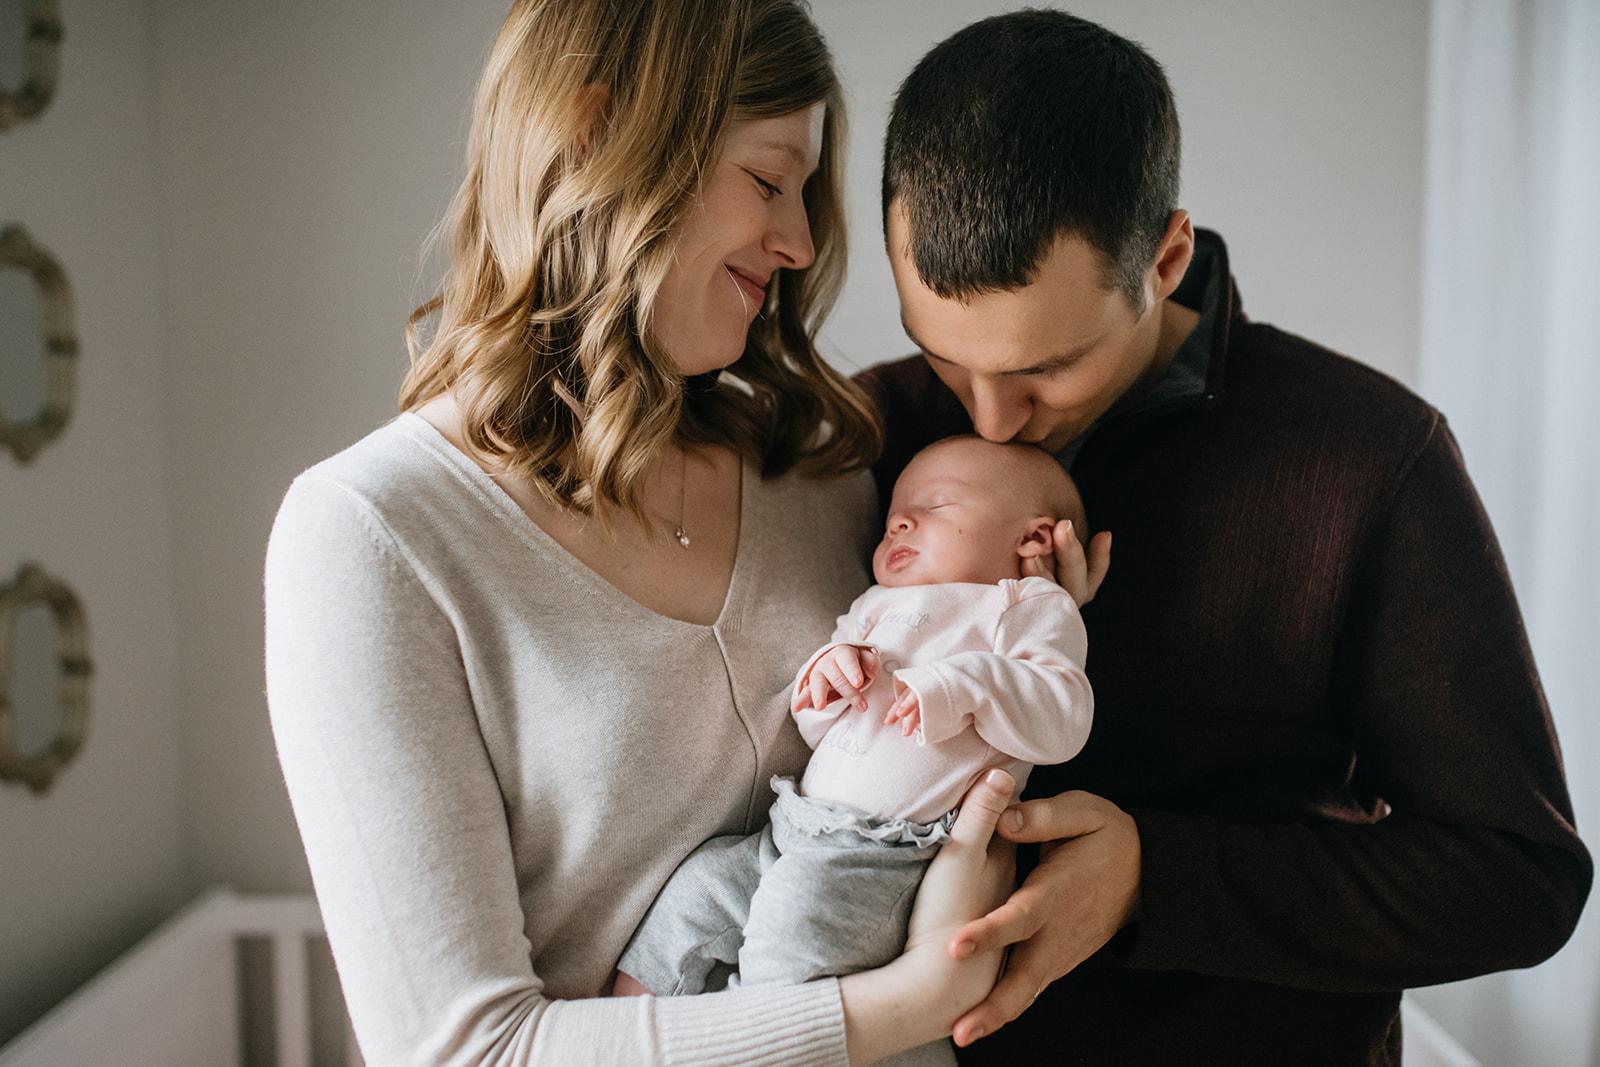 Proud parents hold & kiss newborn baby